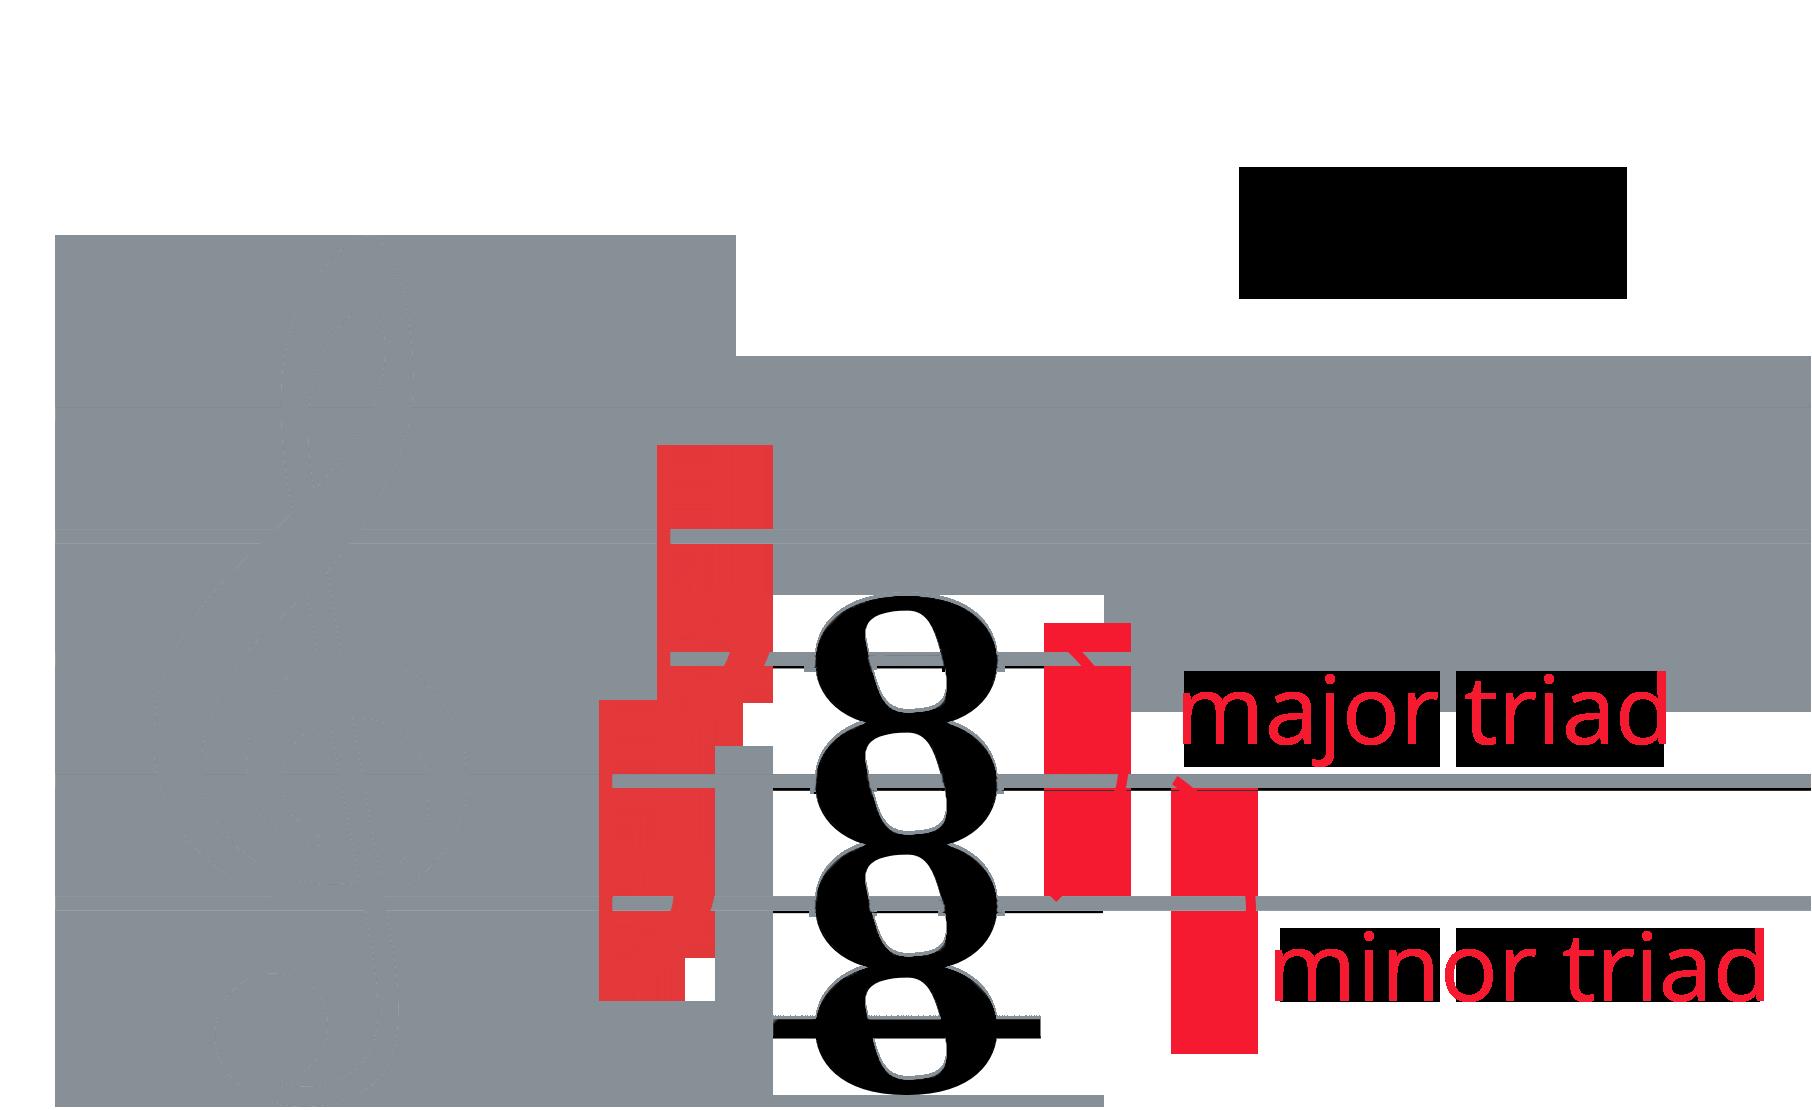 Cm7 piano chord on treble clef with major triad (Eb-G-Bb) and minor triad (C-Eb-G) labelled.